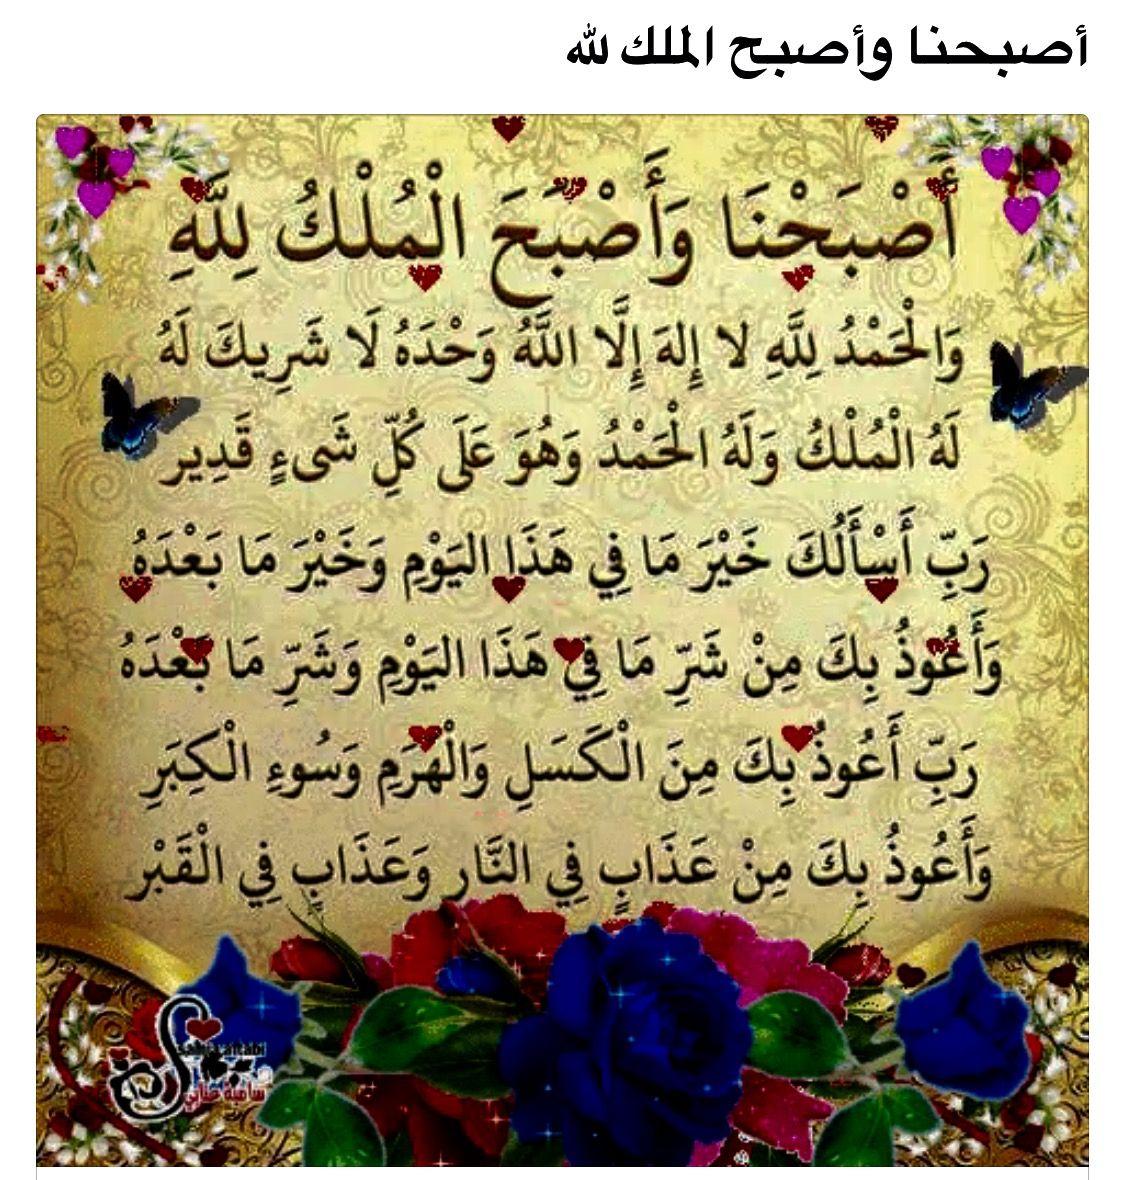 Desertrose أصبحنا وأصبح الملك لله رب العالمين Arabic Calligraphy Art Islam